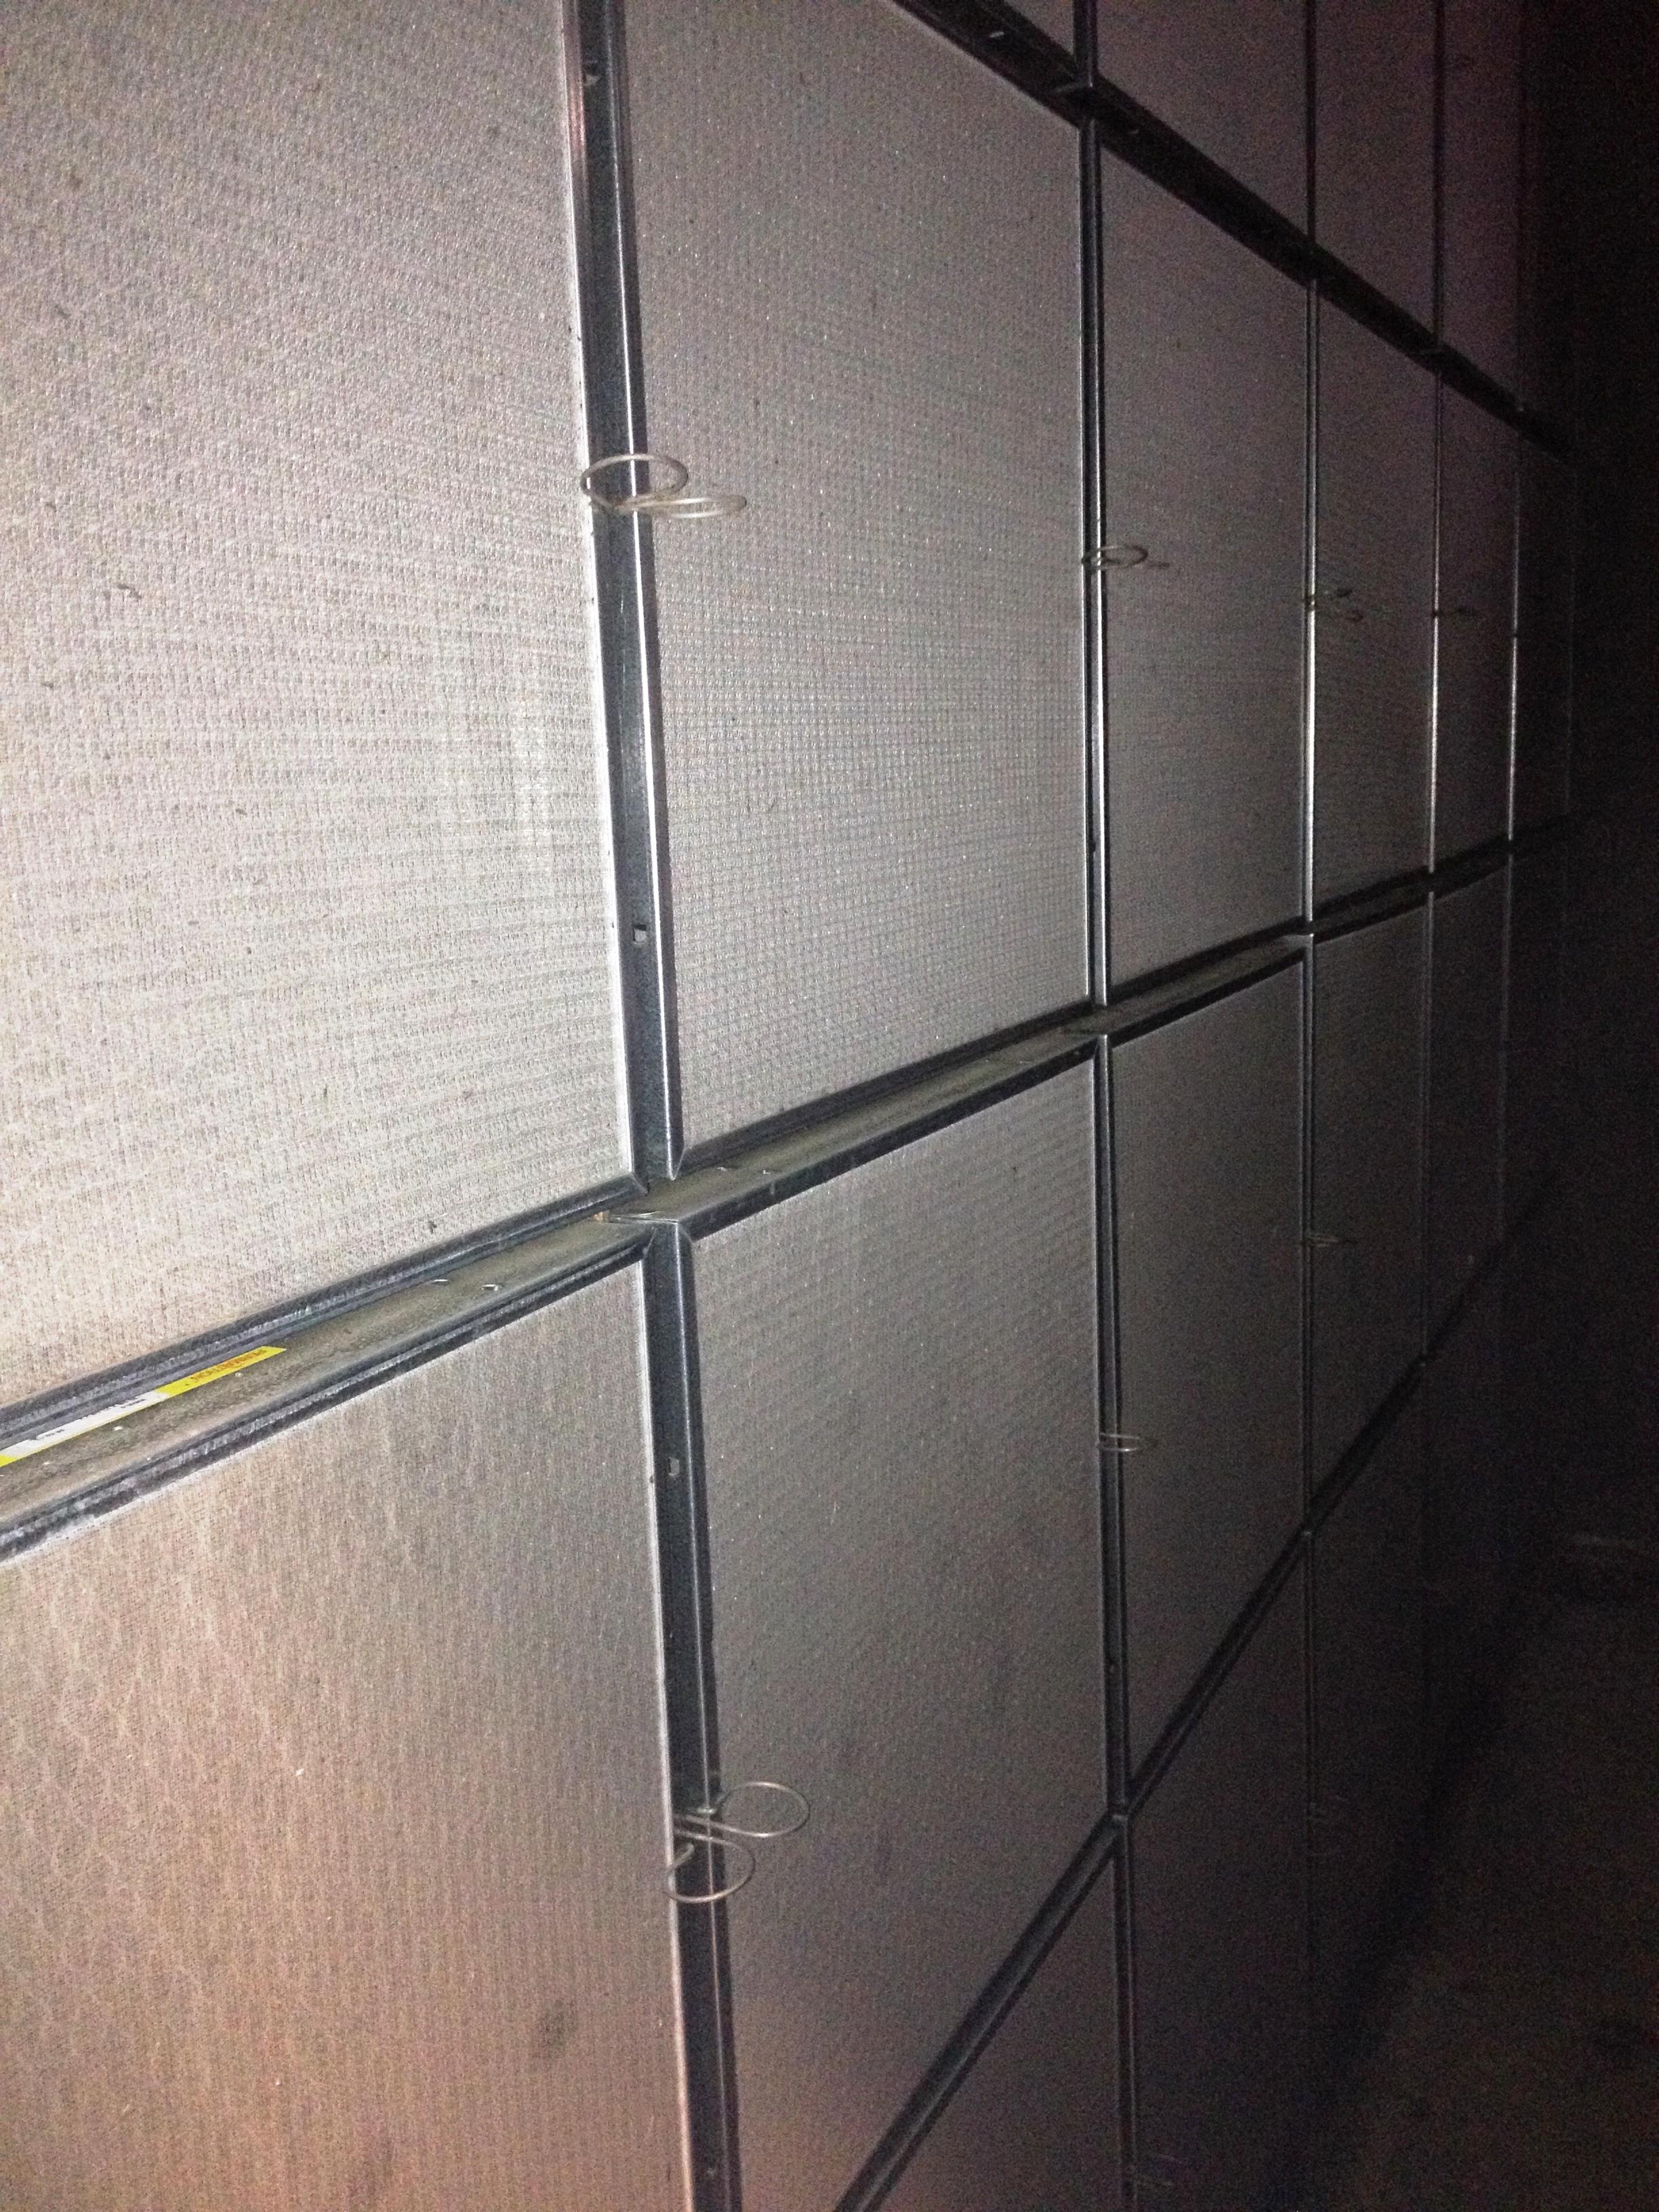 moisture-resistant-model-in-air-filters